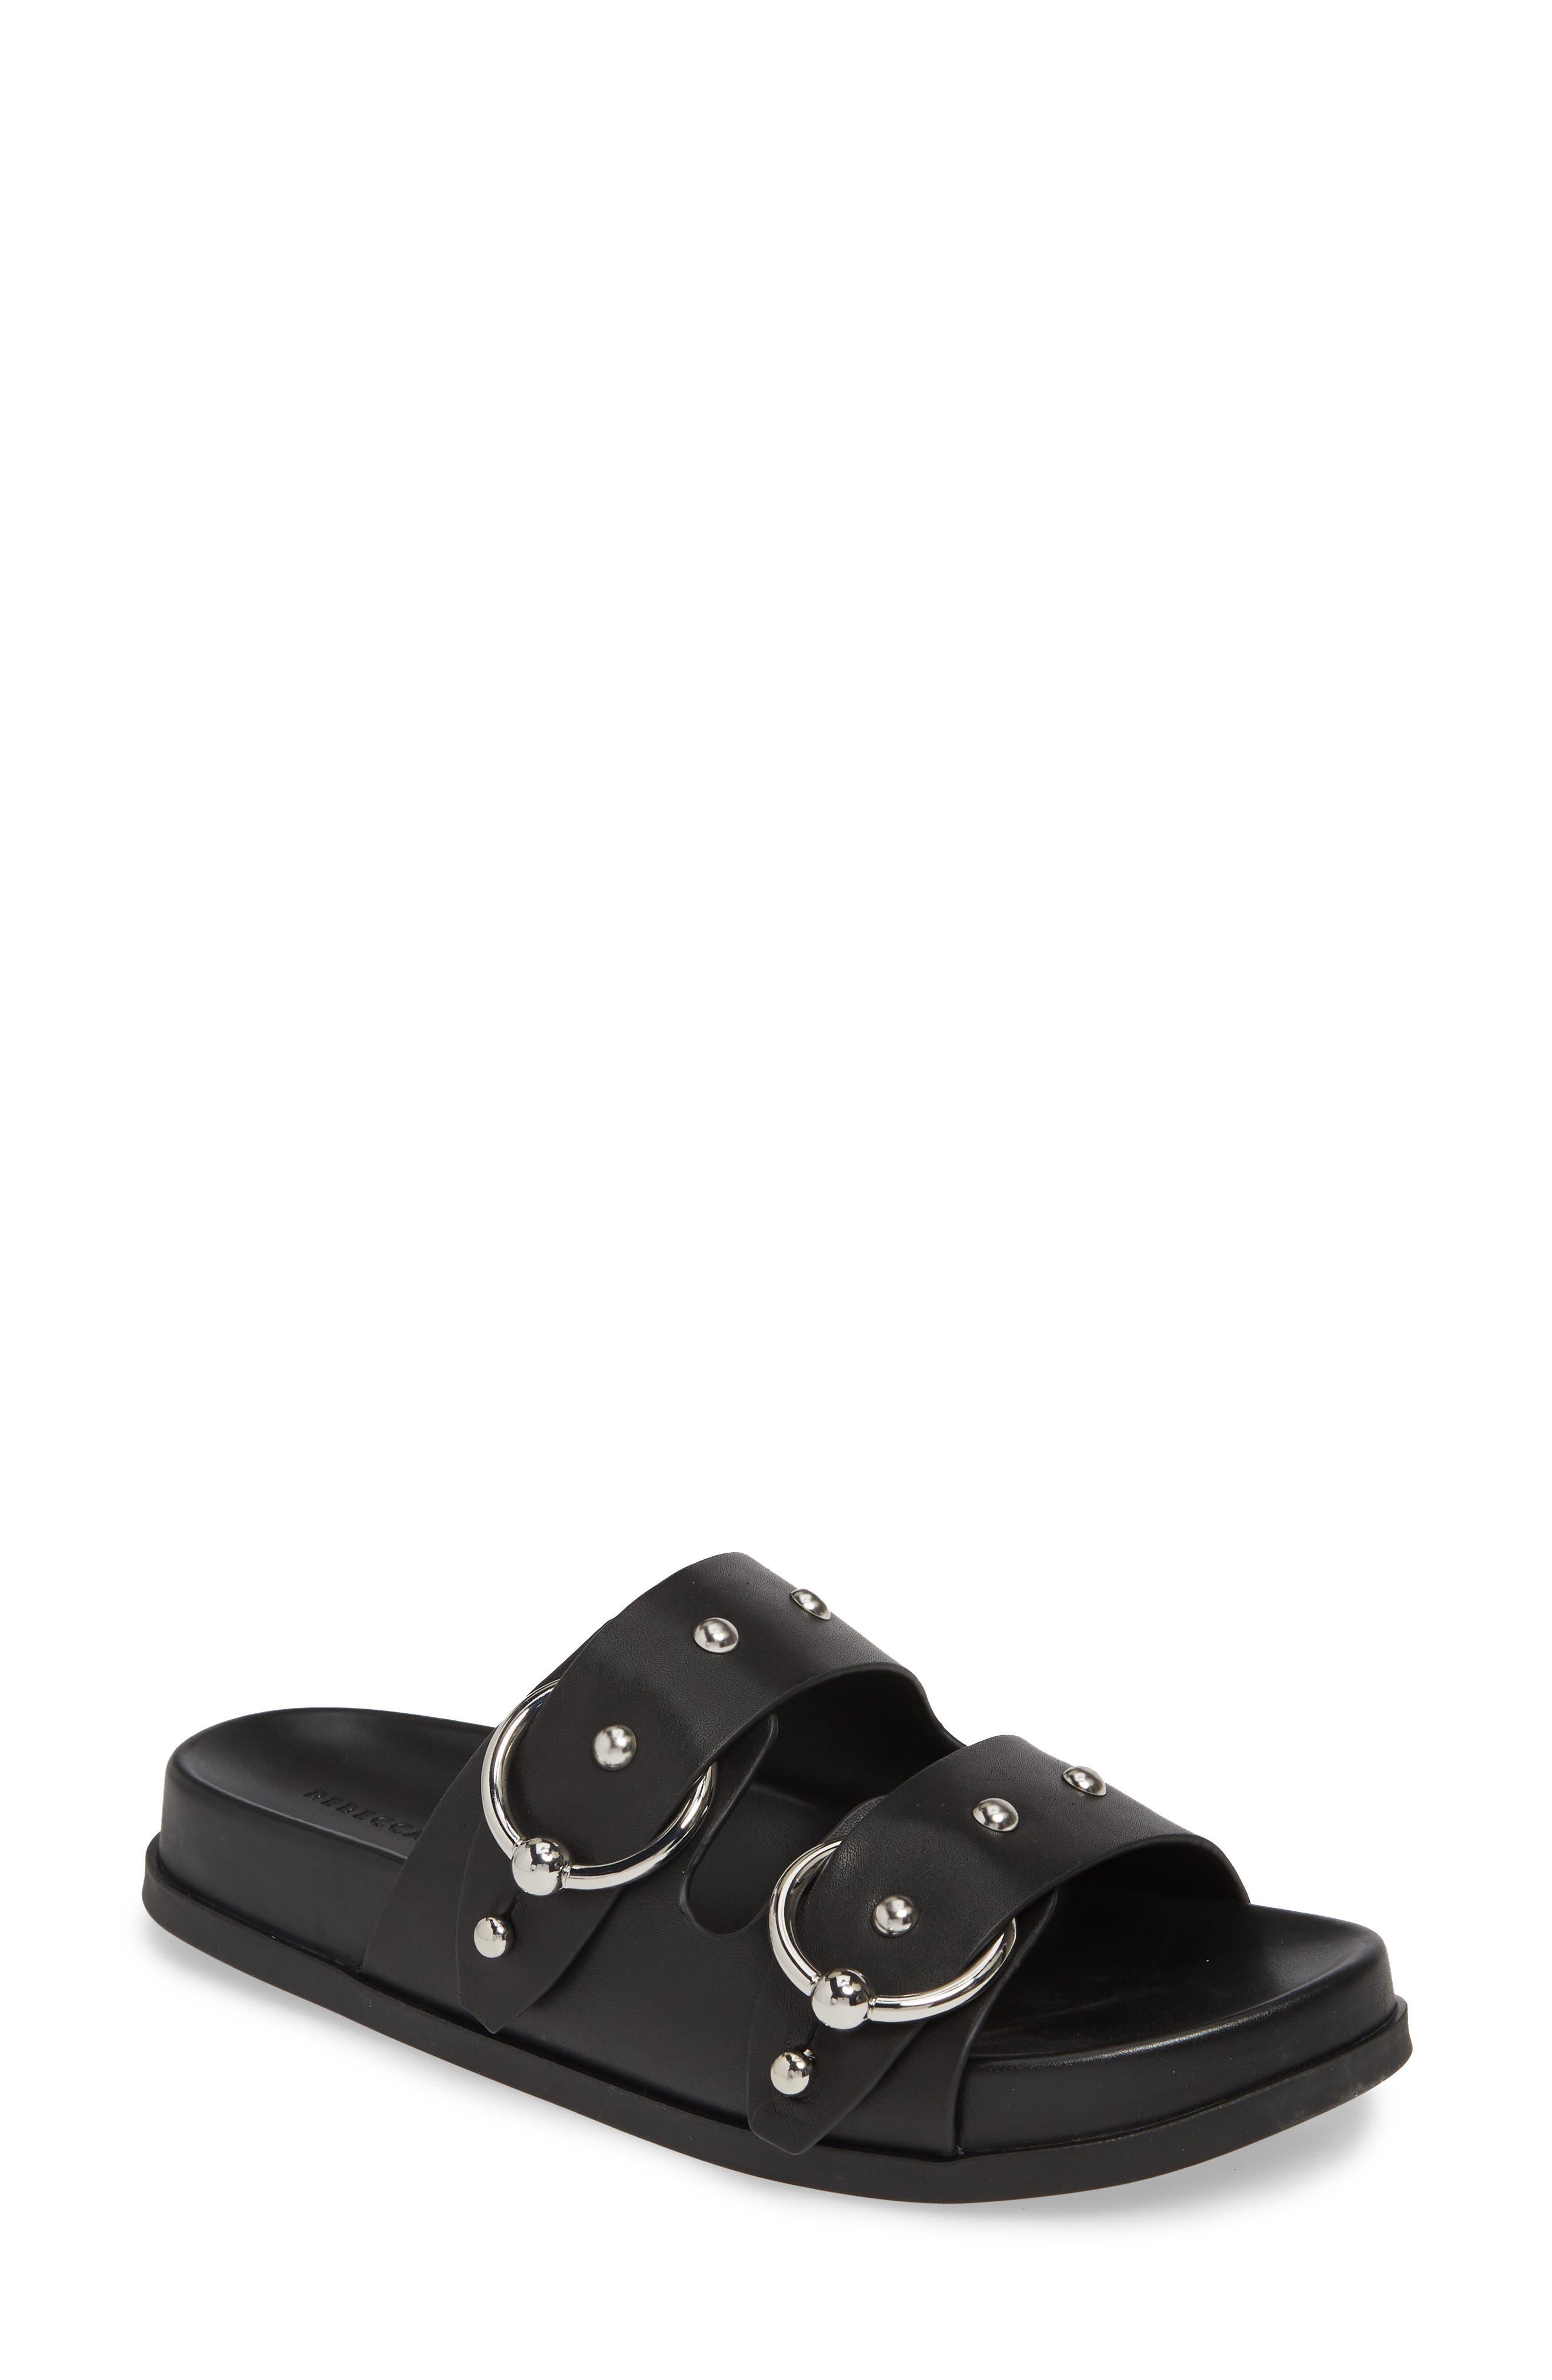 Rebecca Minkoff Vachel Slide Sandal, Black